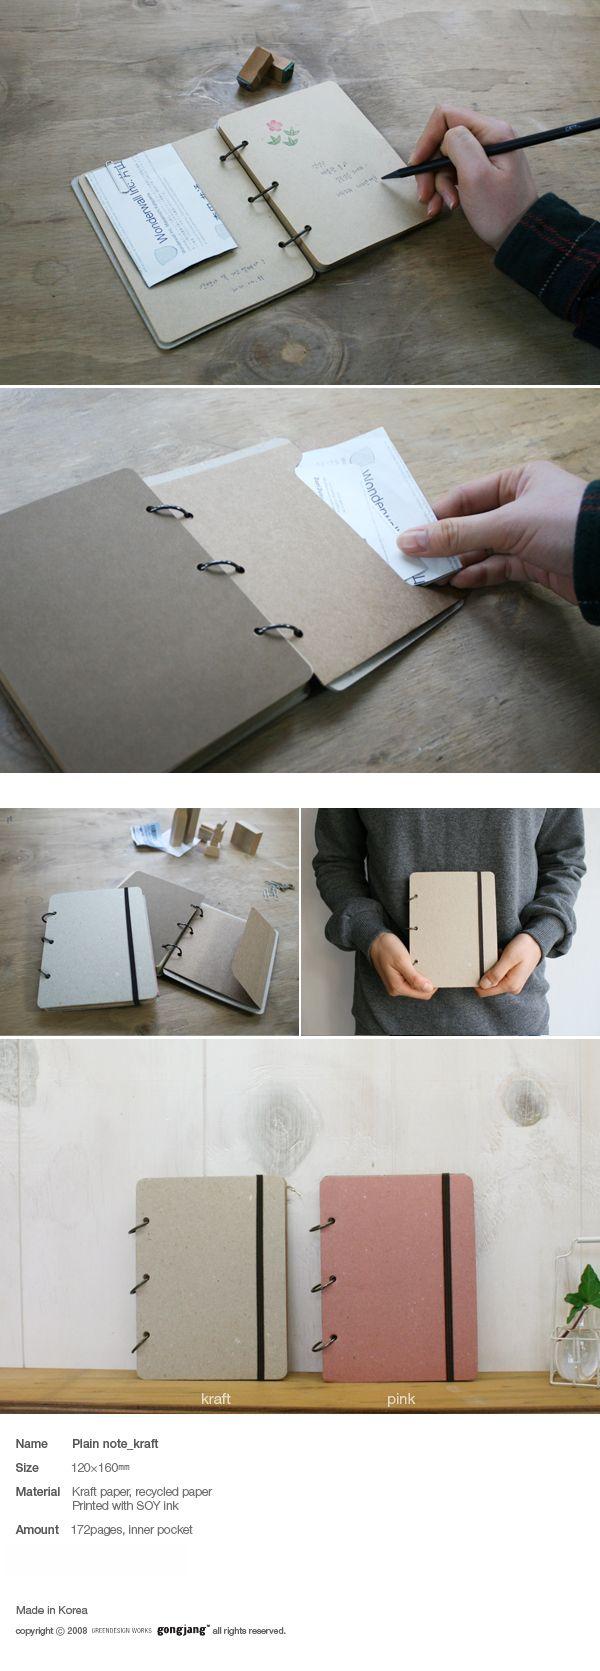 Gongjang | Plain Note | 2.500KD | Made in Korea